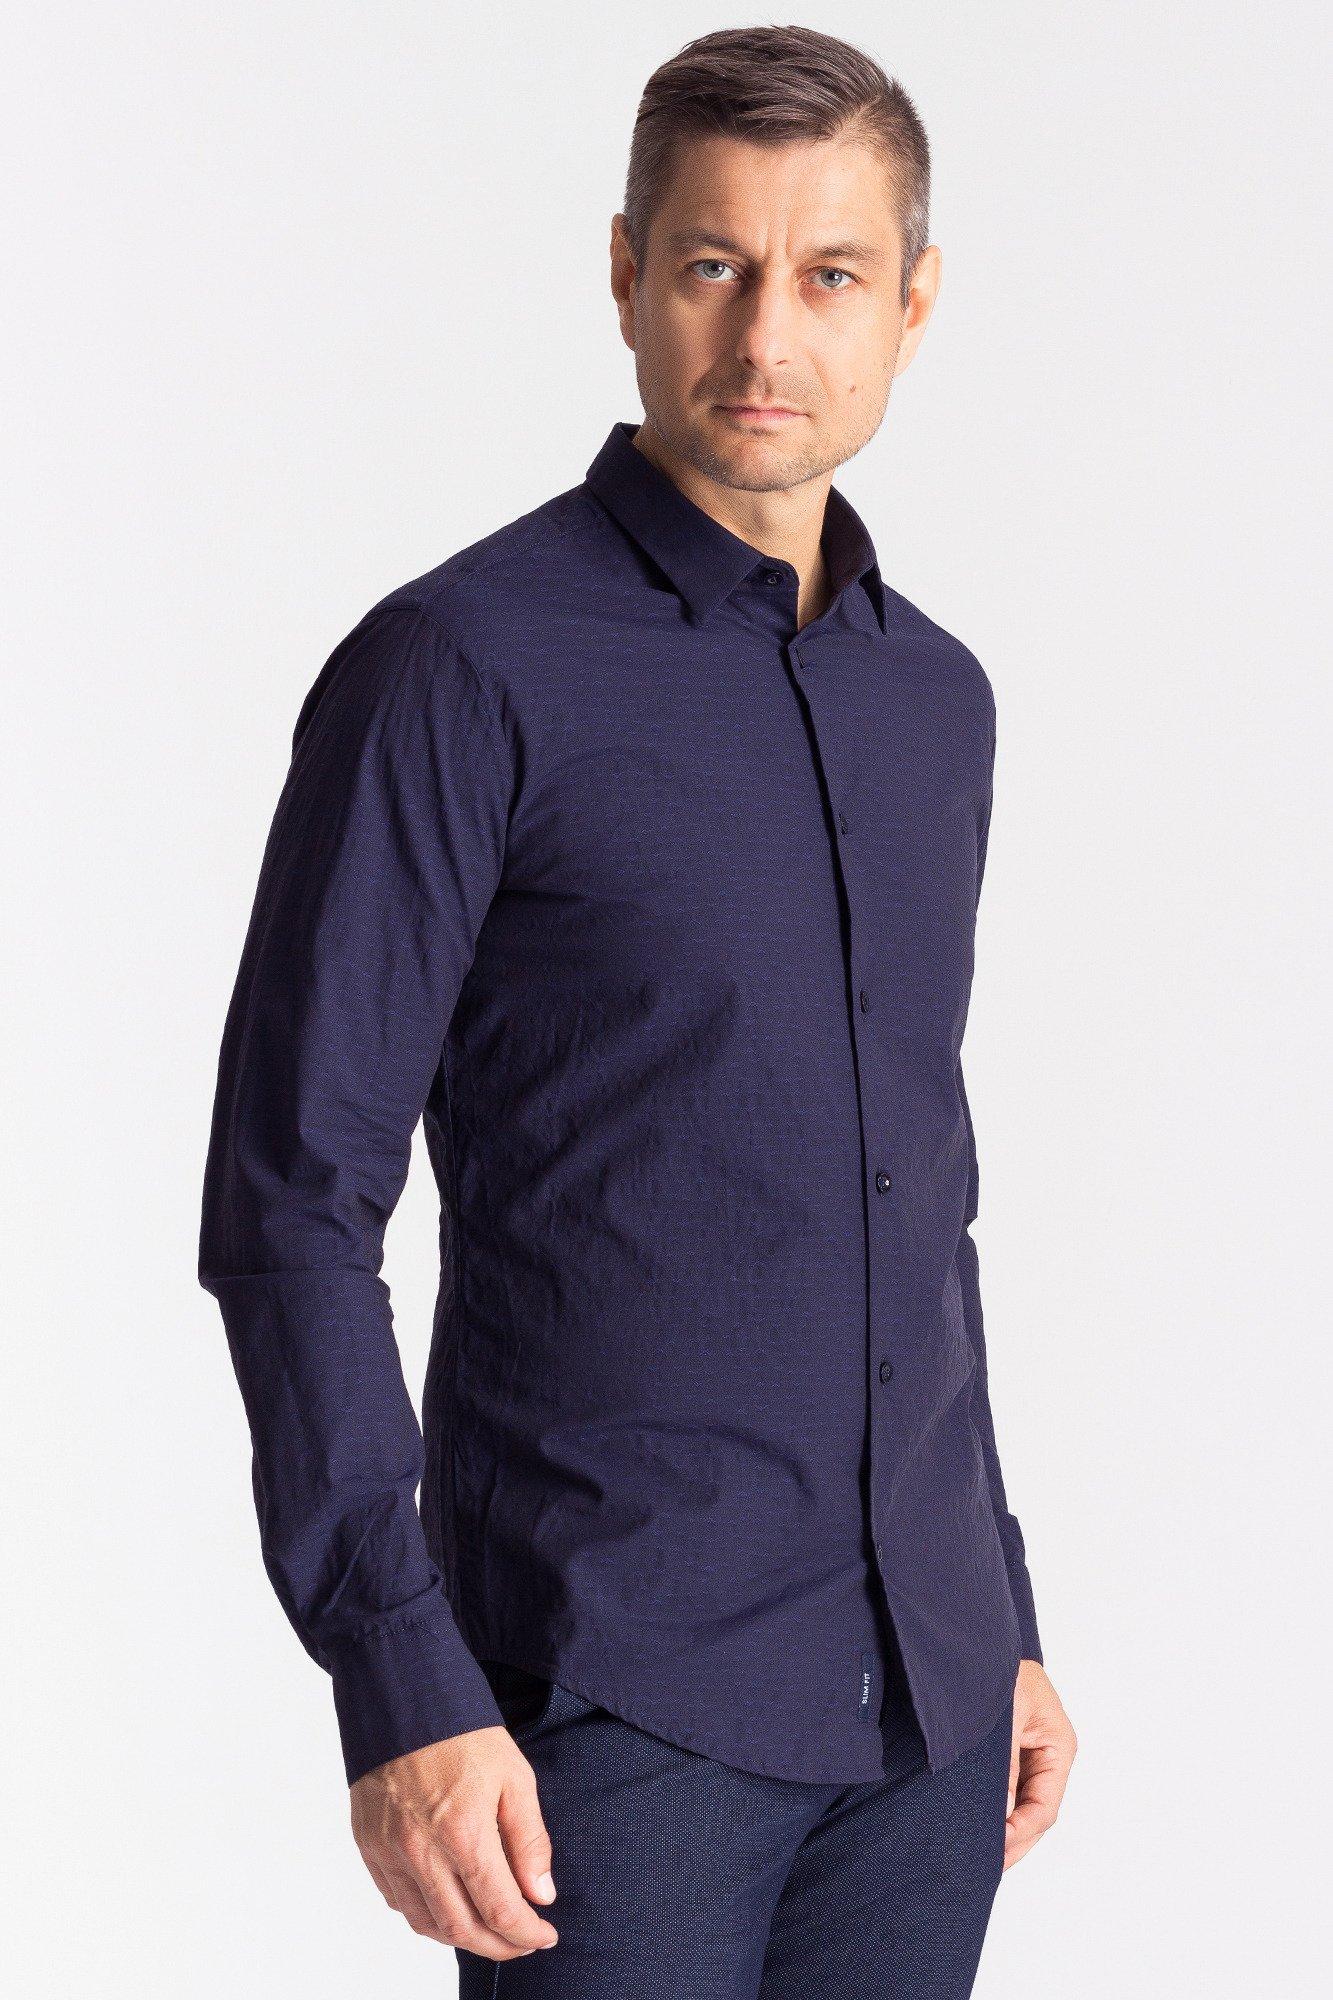 7bc15a0e1a5de Granatowa koszula męska ze wzorem  Granatowa koszula męska ze wzorem ...